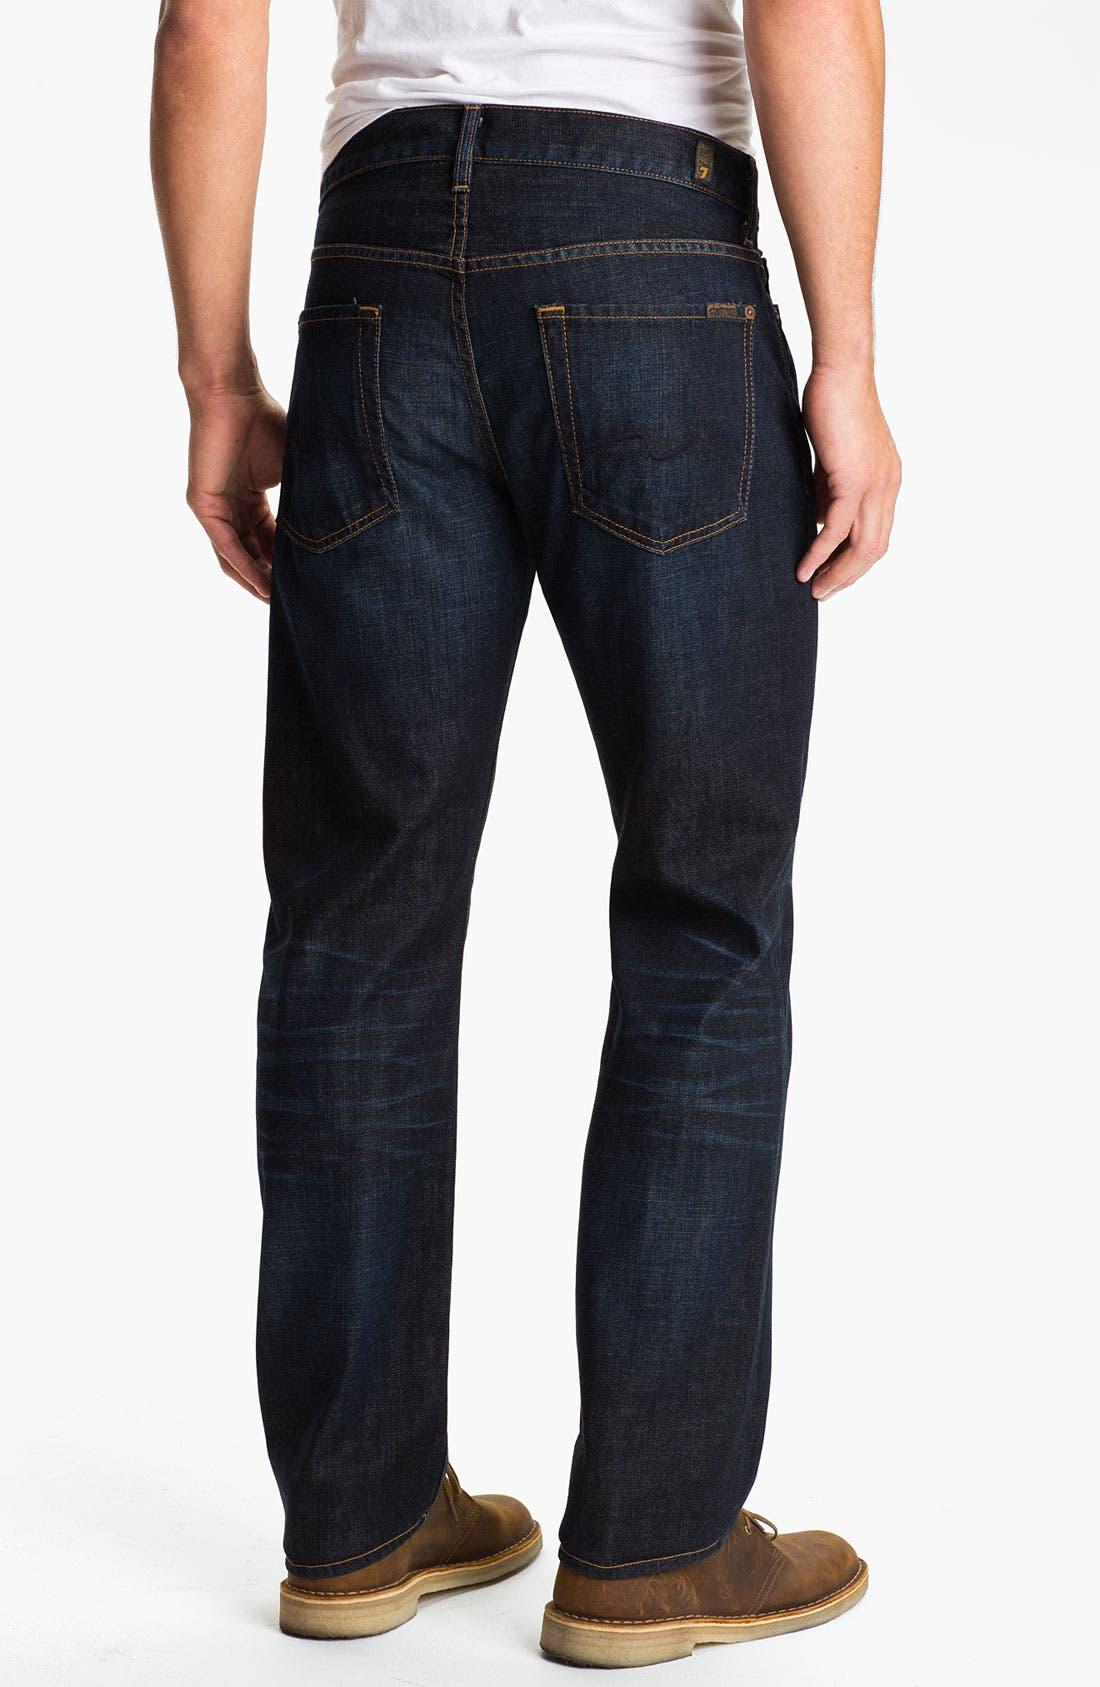 Alternate Image 1 Selected - 7 For All Mankind® 'Standard' Straight Leg Jeans (Porterville)